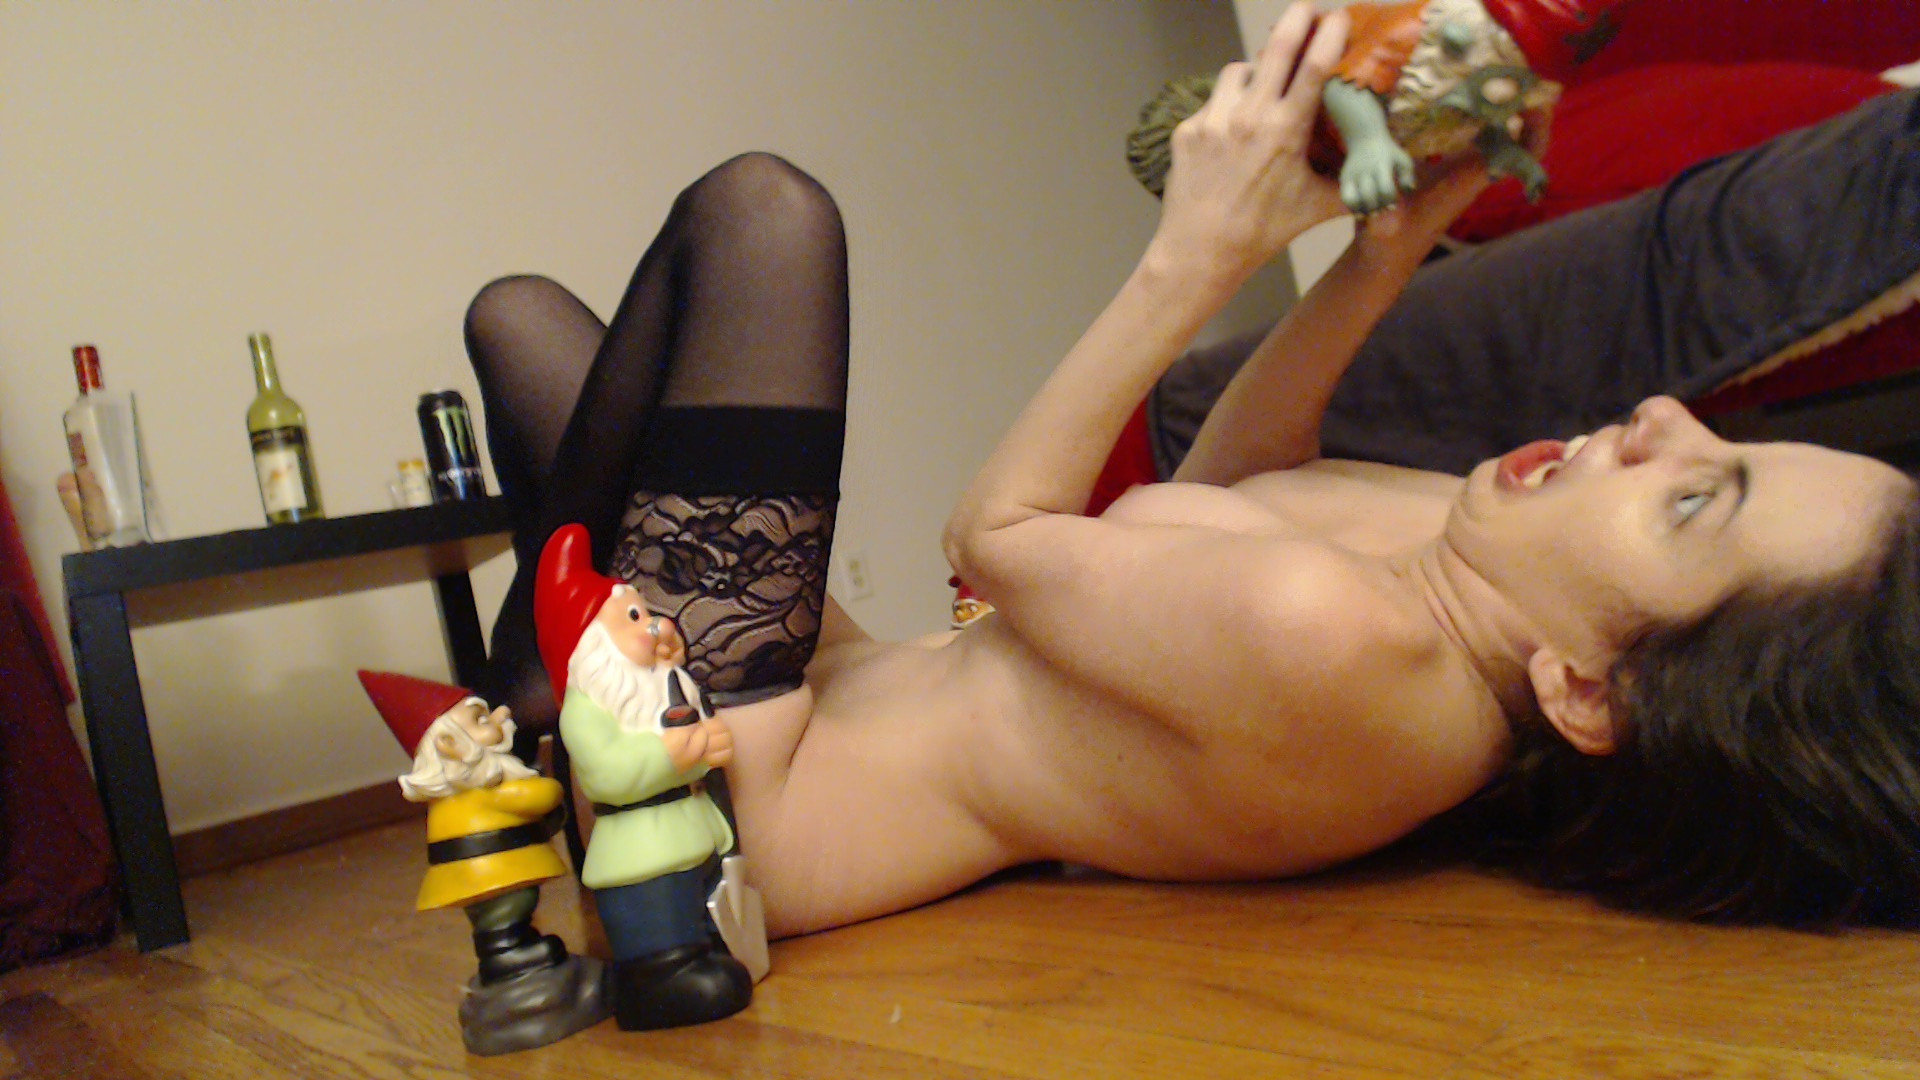 Erotic photos dwarf women nackt film